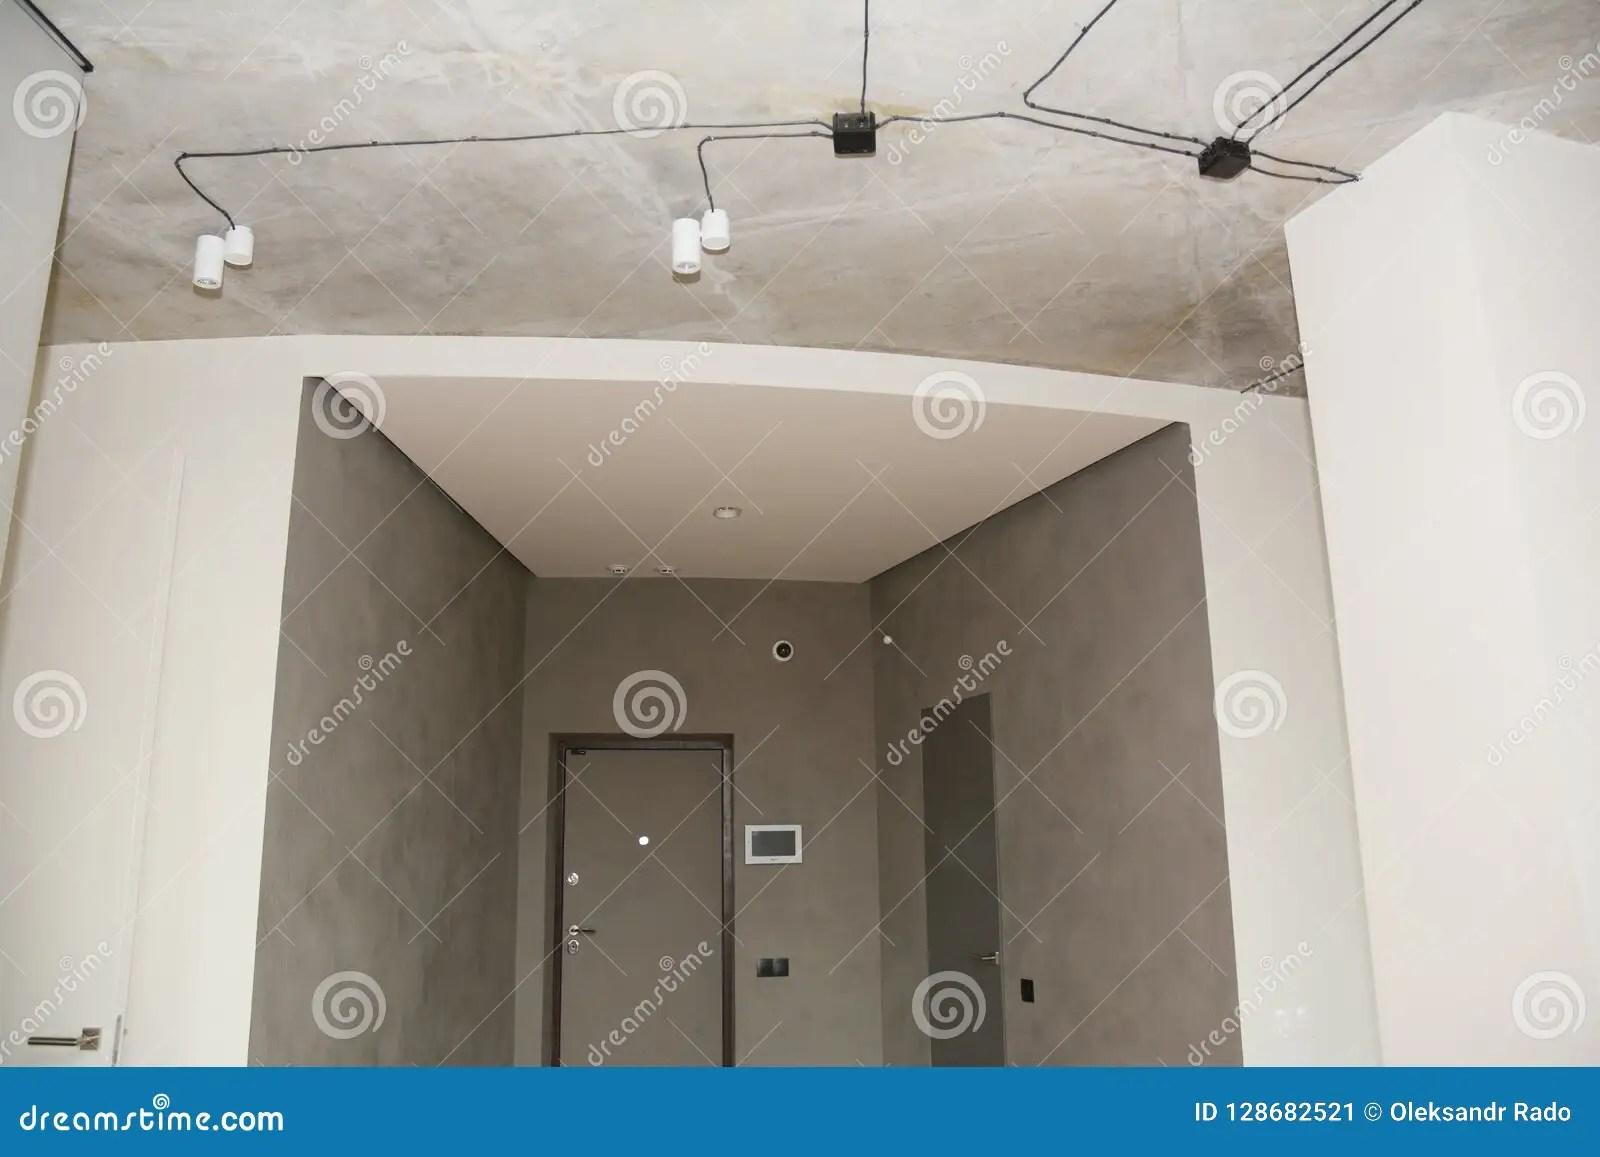 https www dreamstime com modern house lighting design entrance hall sma smart technology near door ceiling lamp image128682521